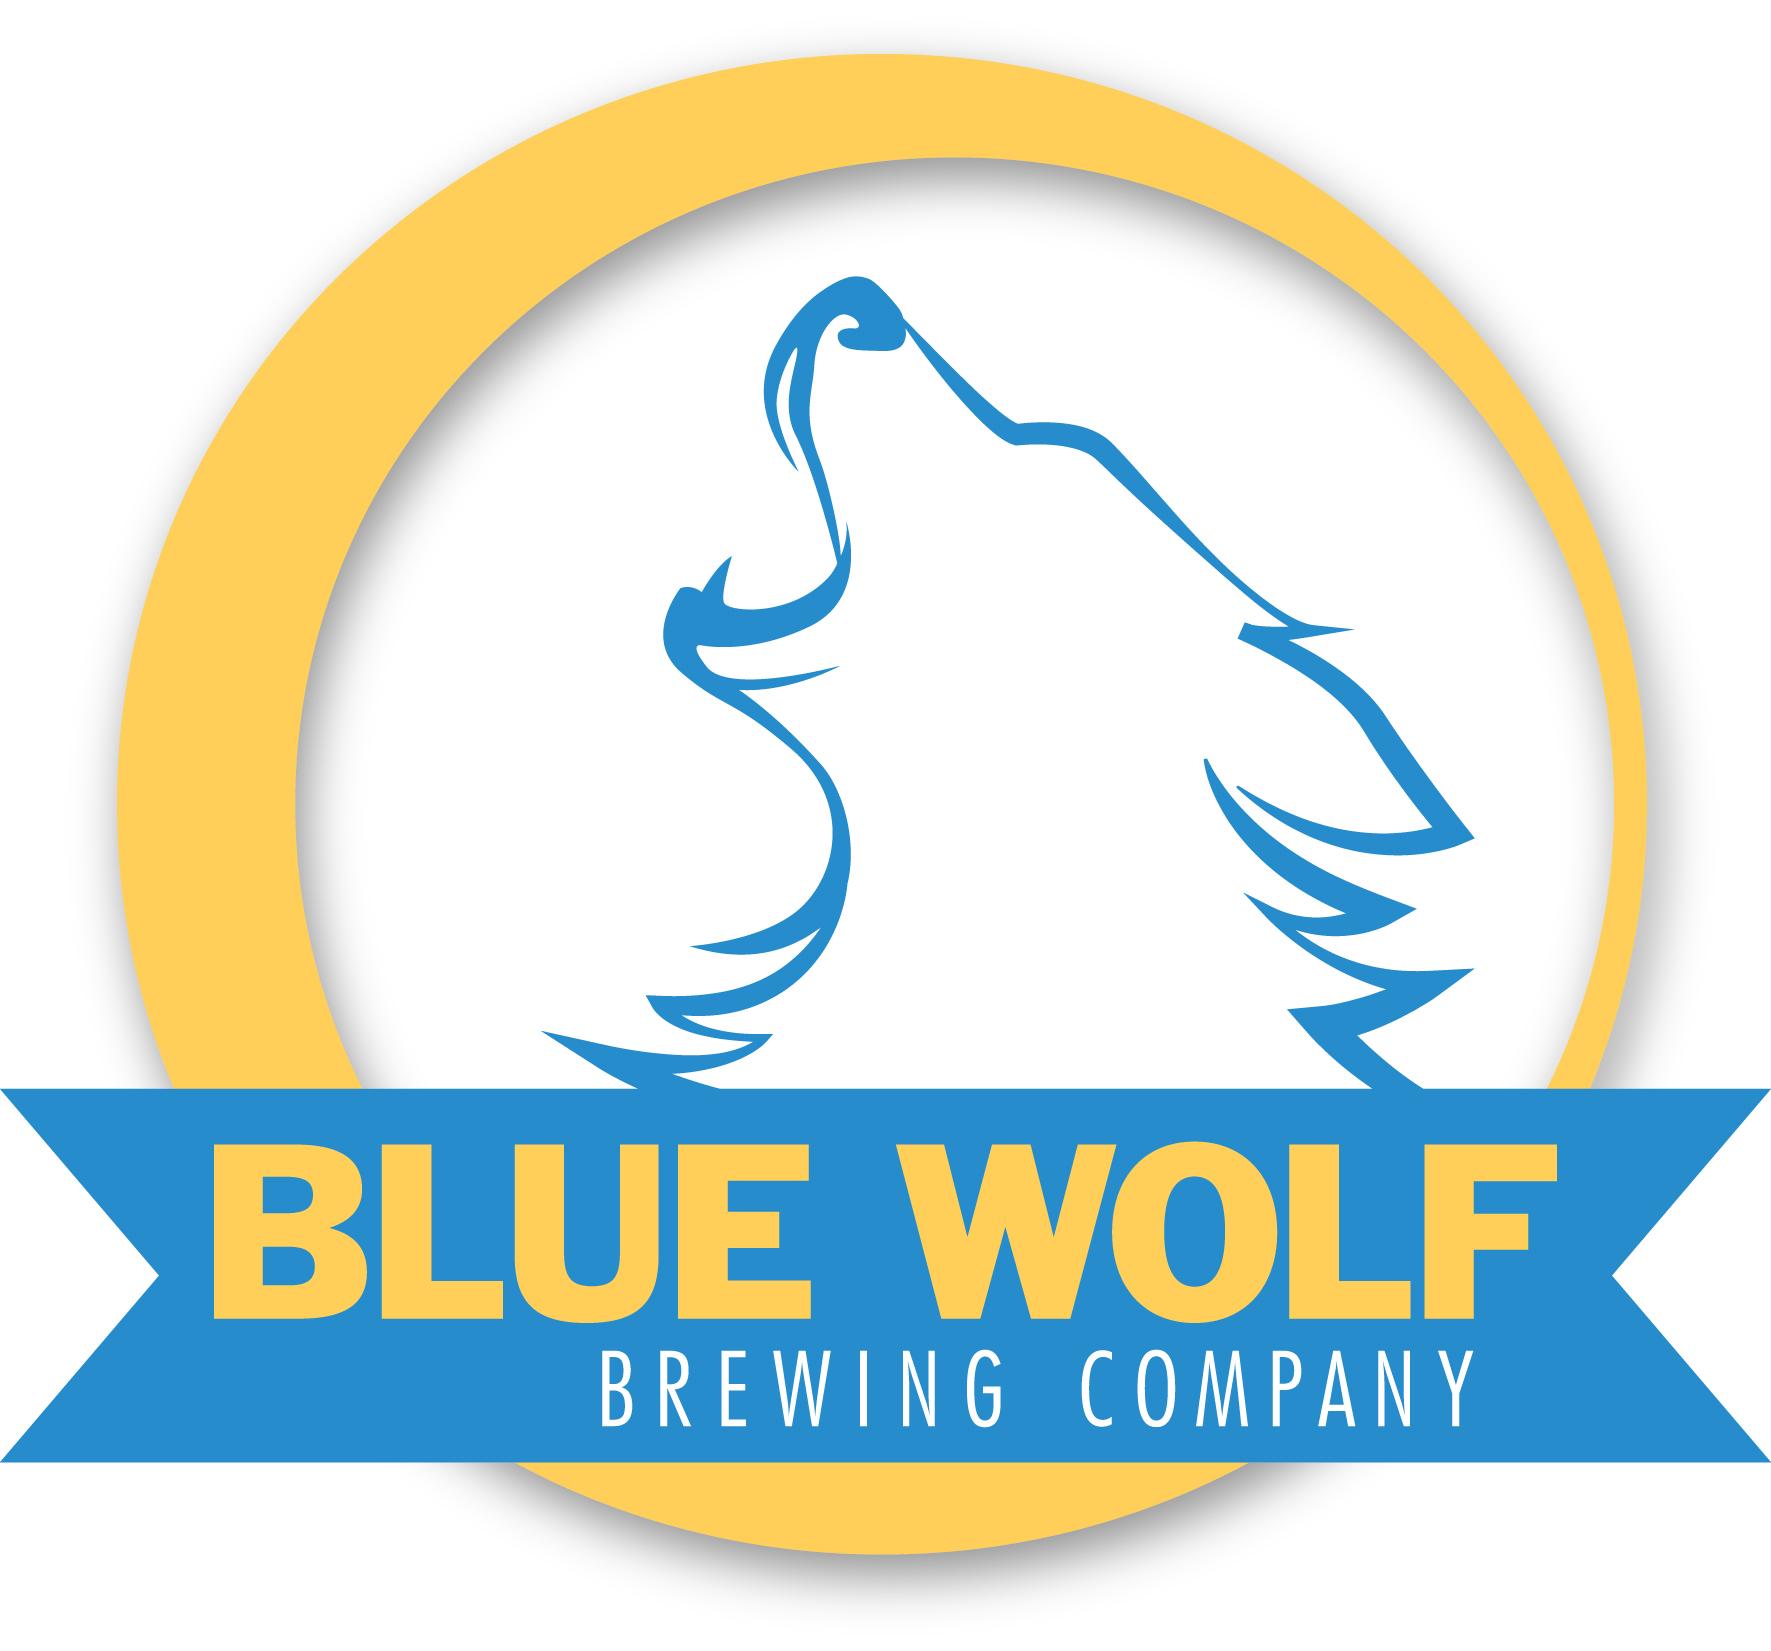 BlueWolf_2Clr_shadow.jpg